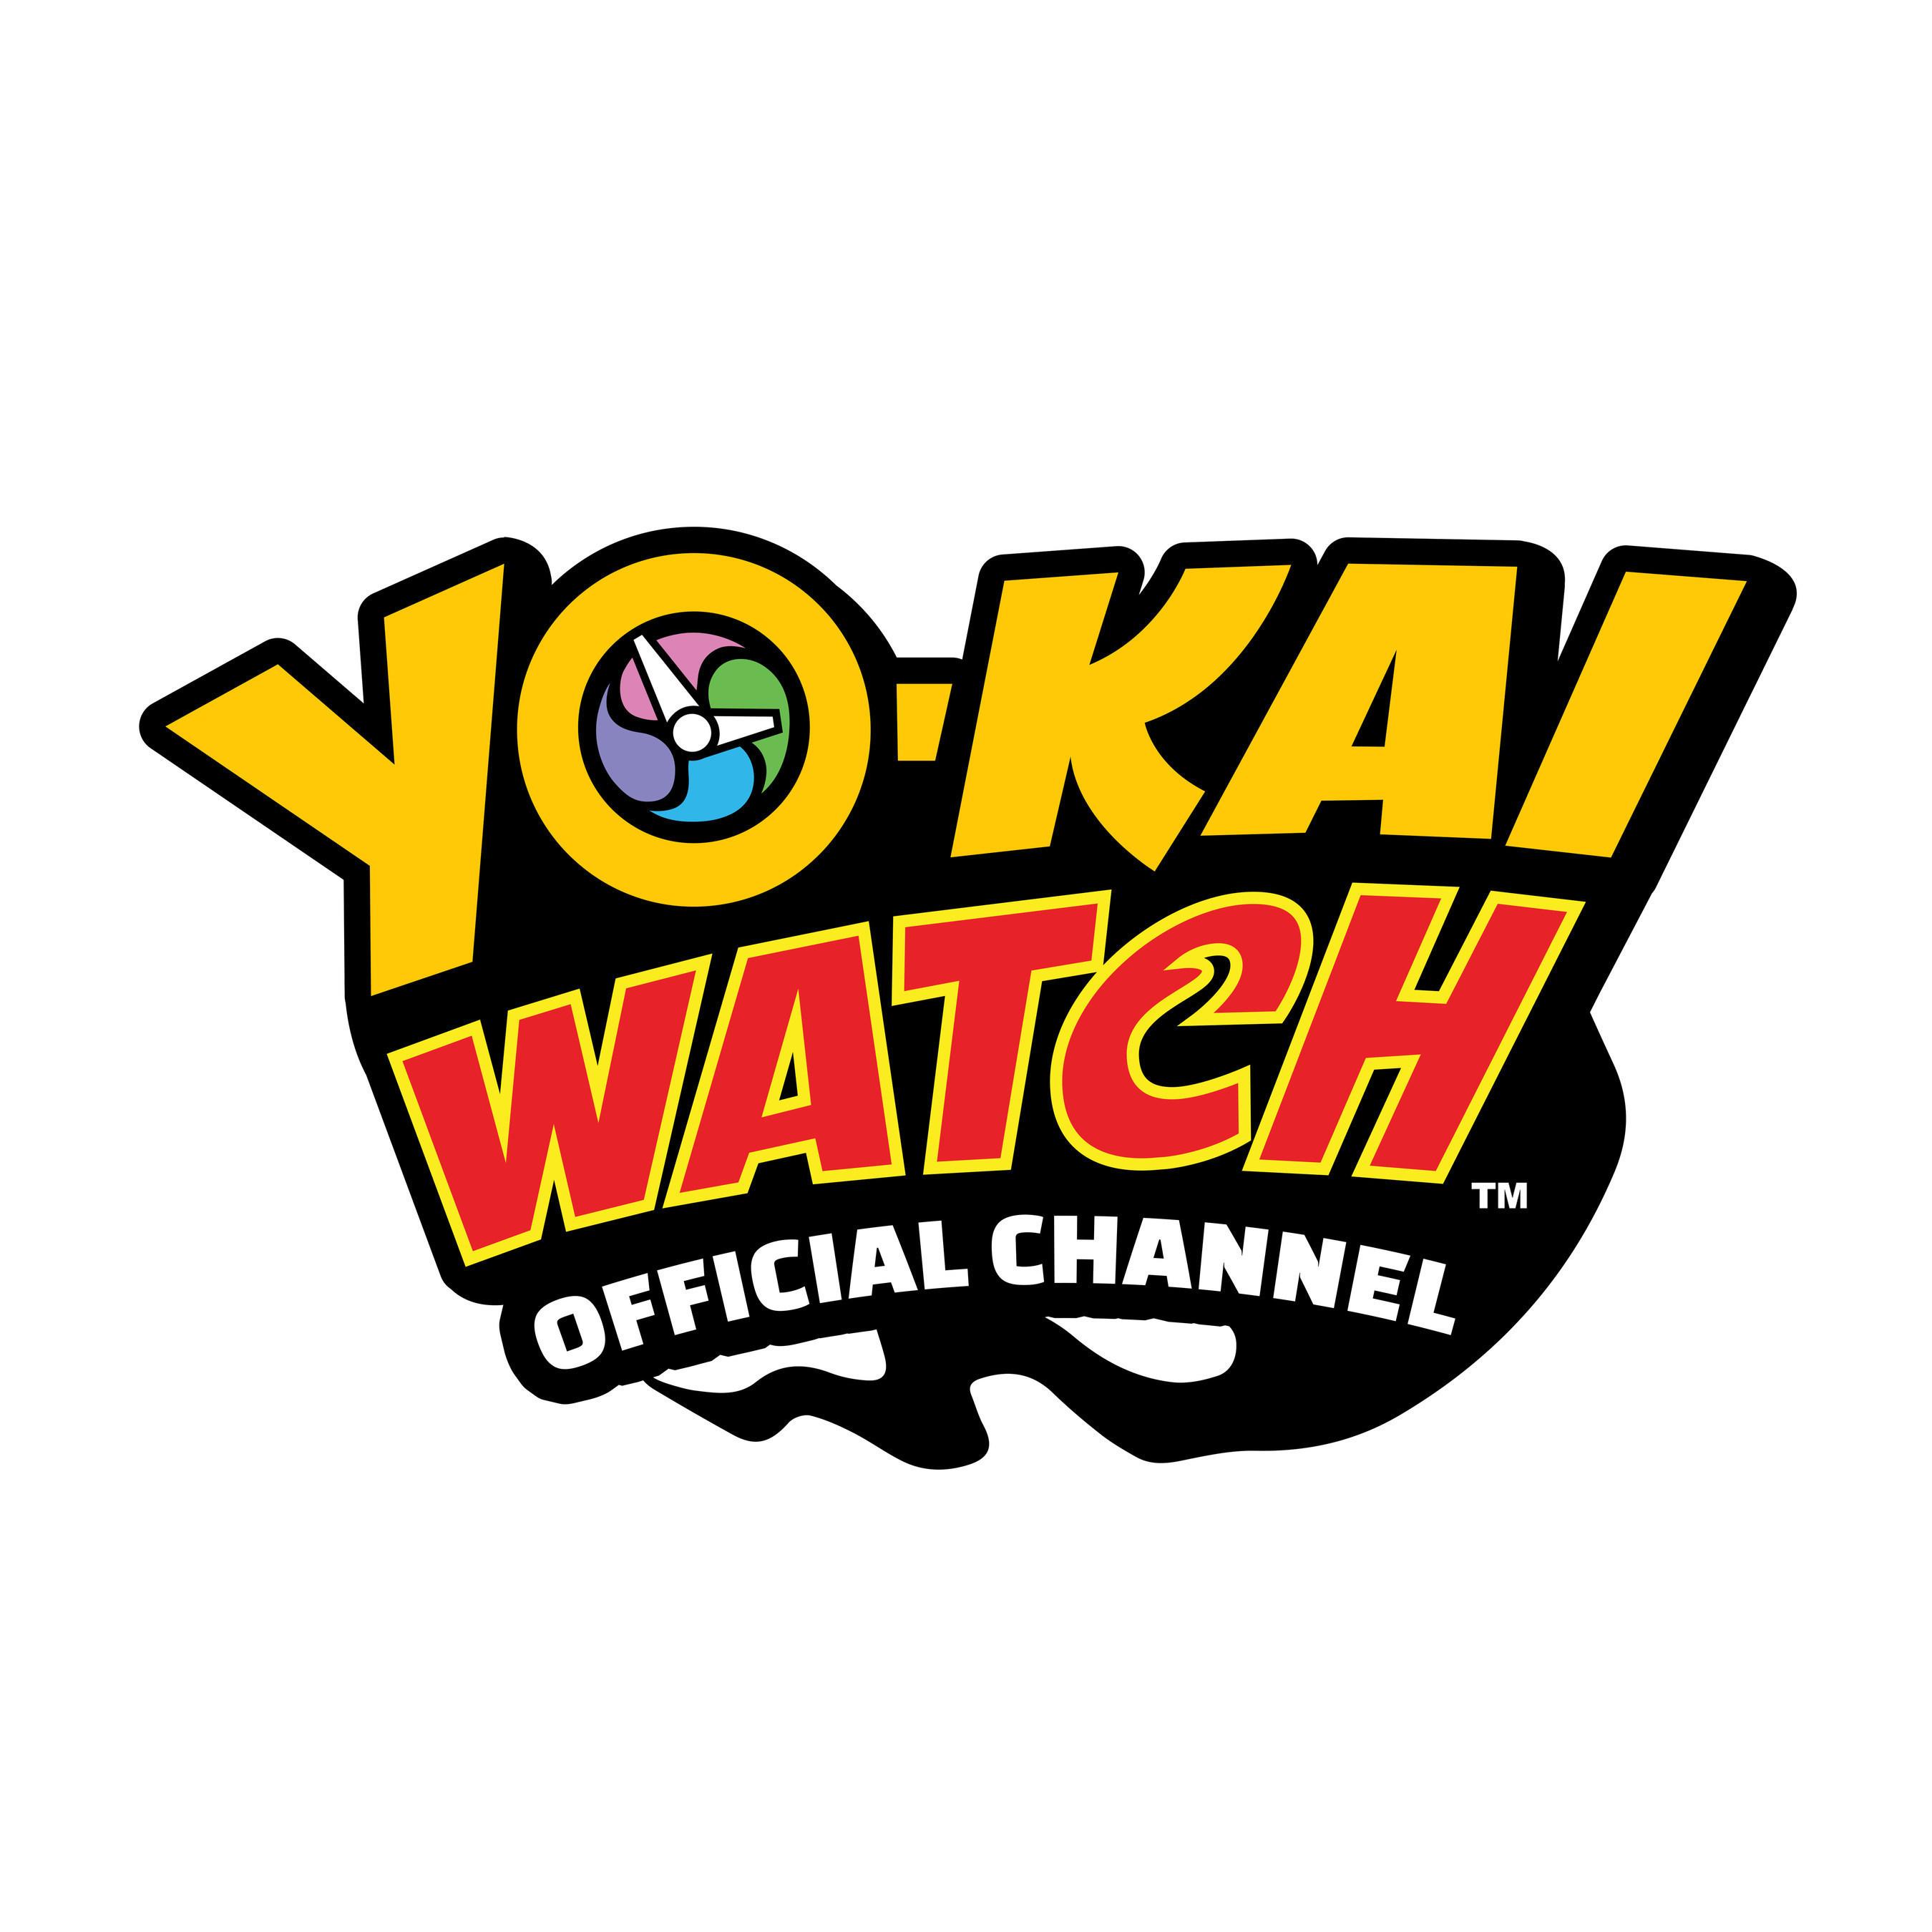 Enjoy Full Episodes Of Hit Anime Show YO-KAI WATCH Now Available On YouTube Anytime!